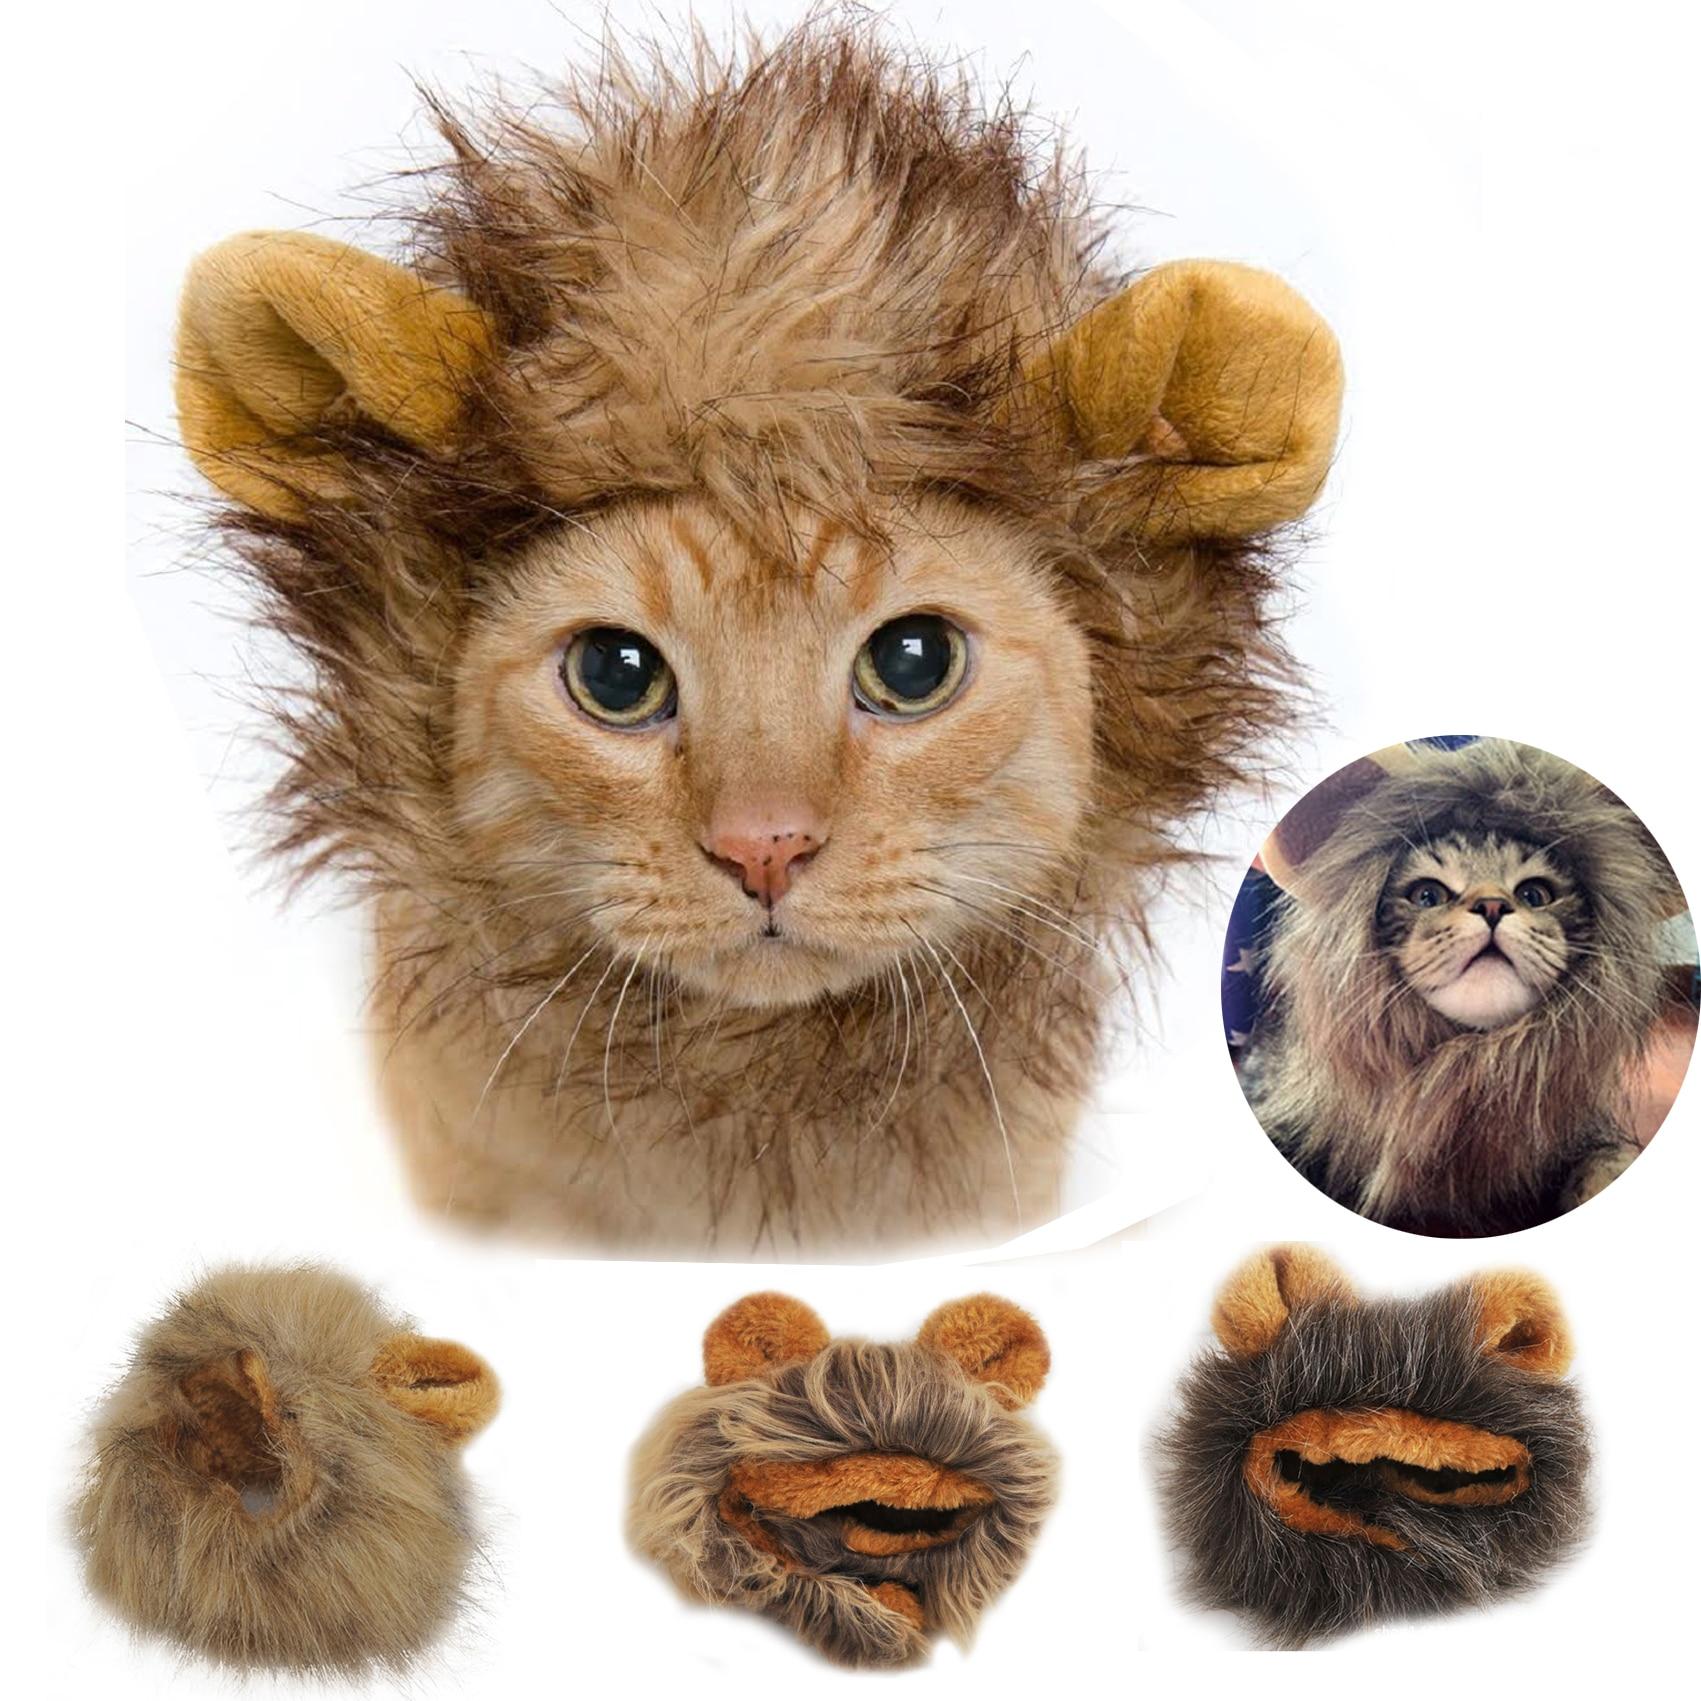 இ1 unid mascotas perro gato lindo divertido sombreros perrito León ...